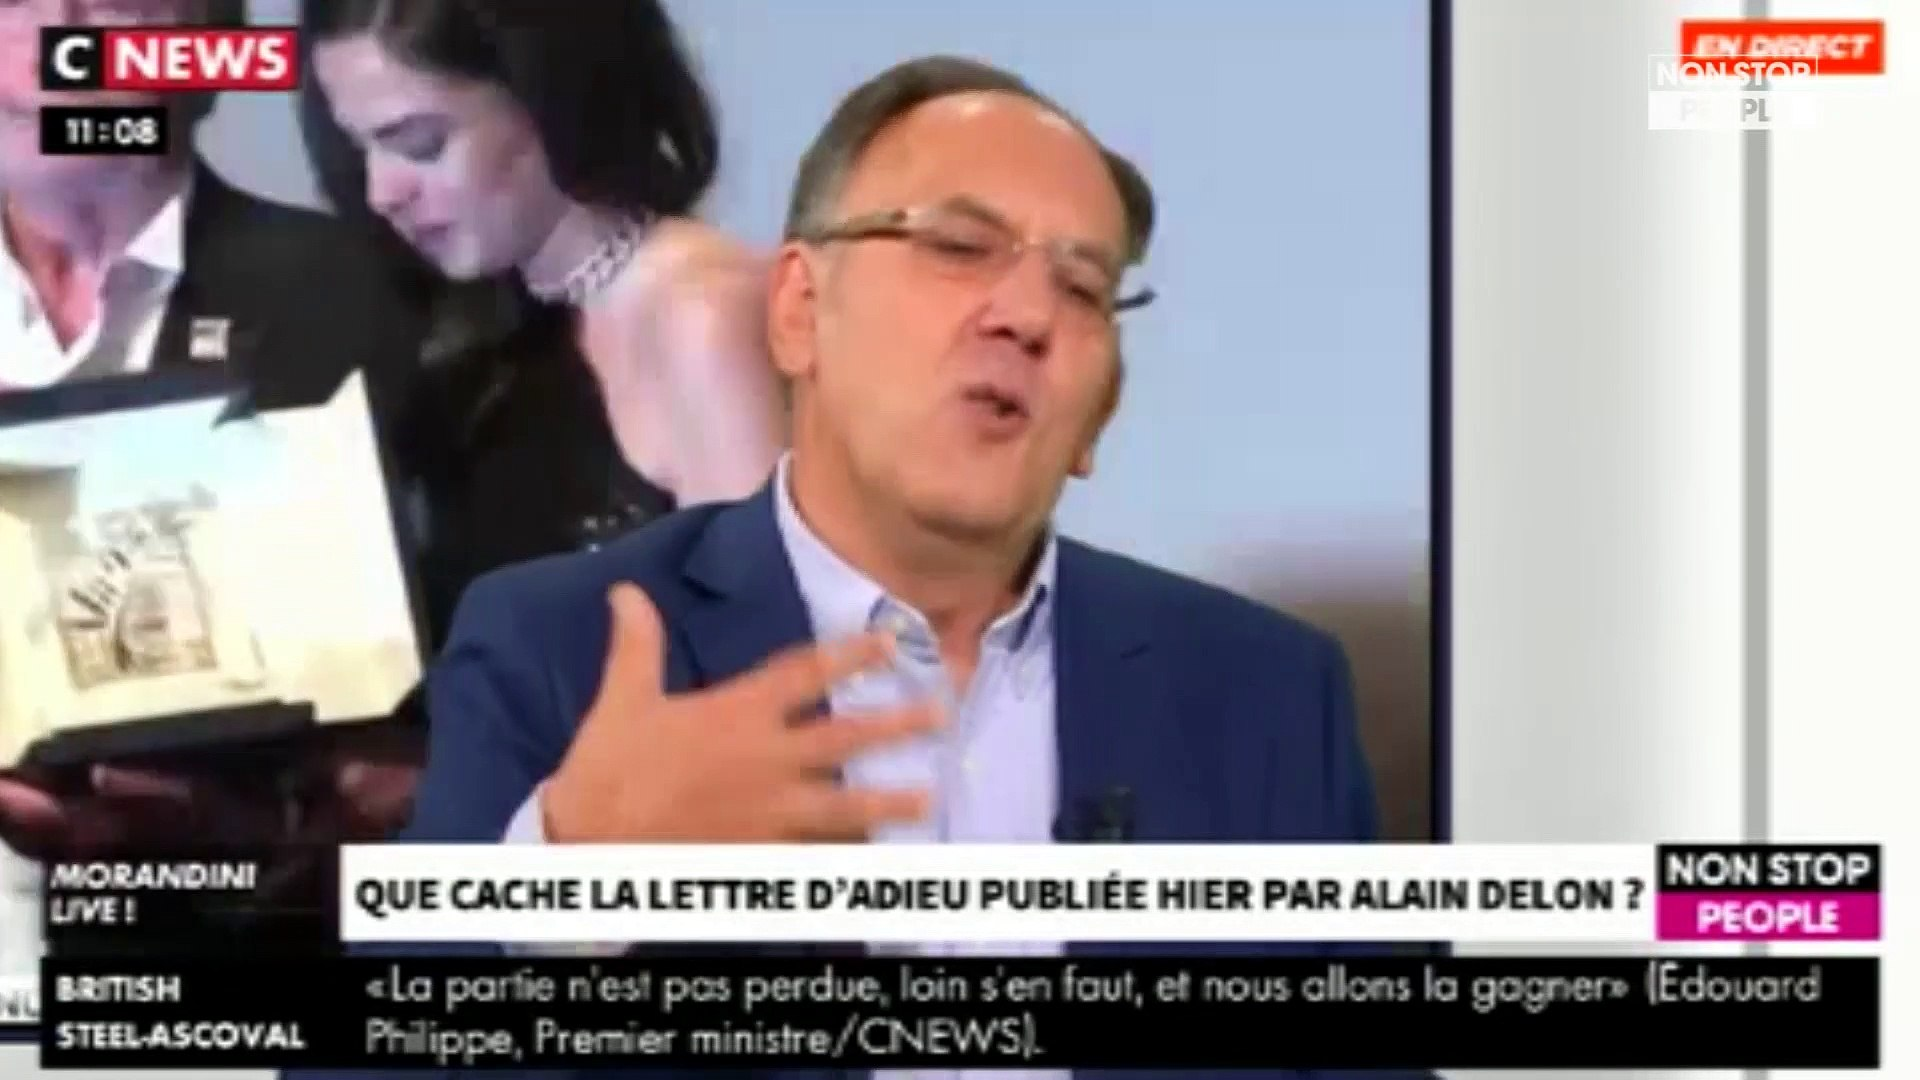 Morandini Live – Alain Delon : que cache sa lettre d'adieu ? (vidéo)